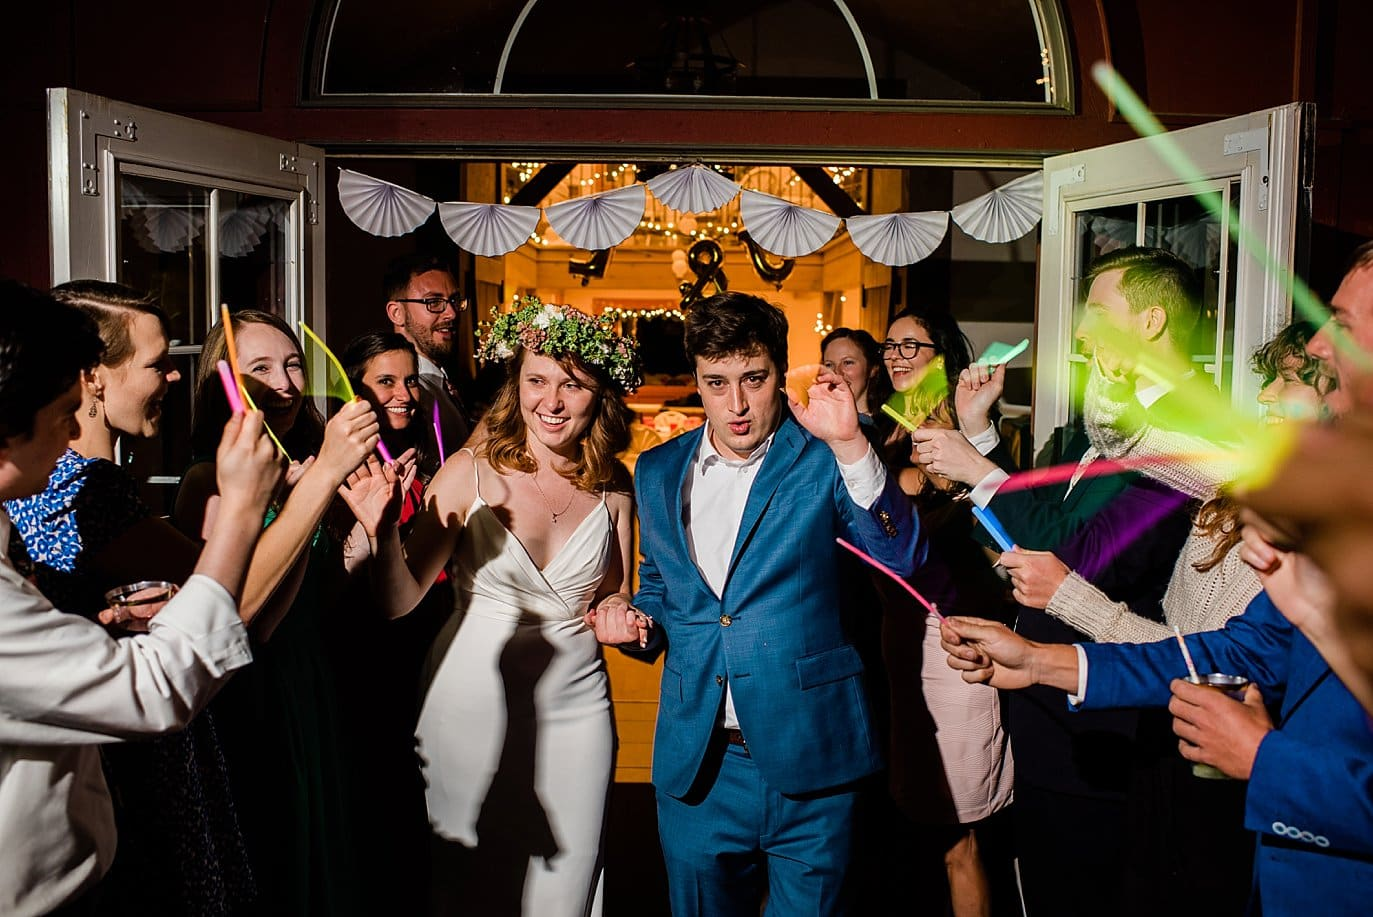 glow stick exit at wedding photo